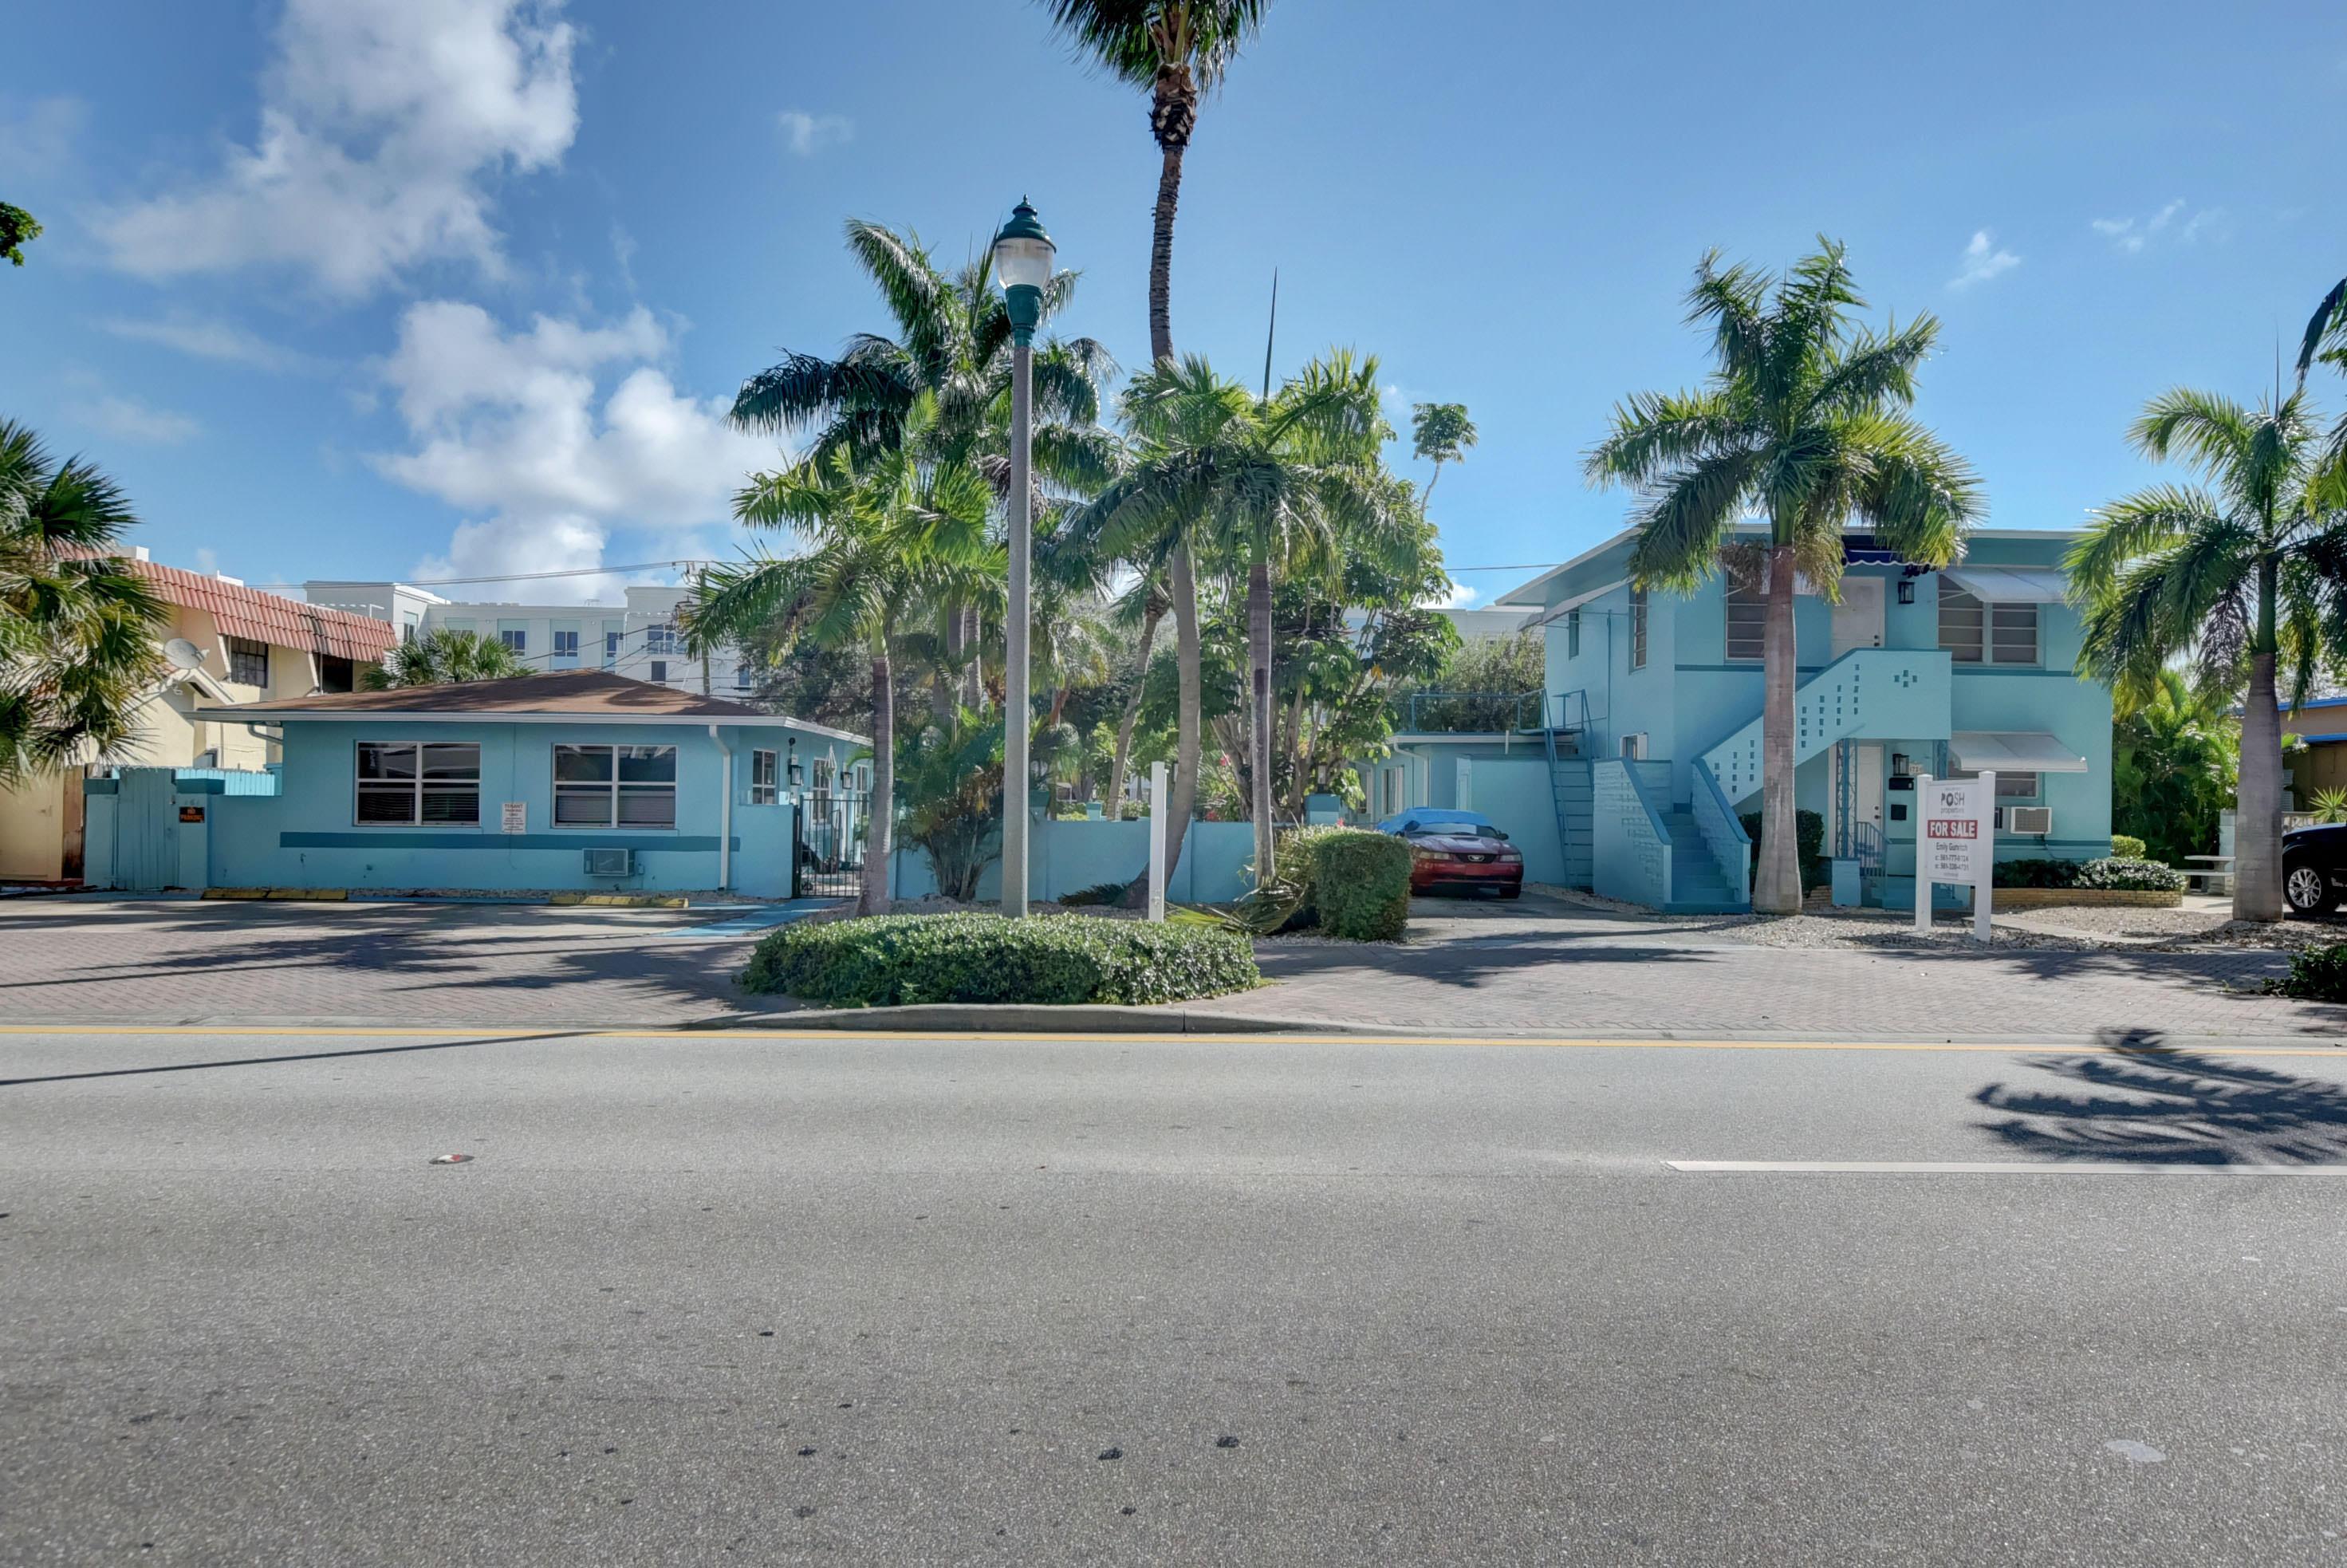 173 5th Avenue, Delray Beach, Florida 33483, ,9 BathroomsBathrooms,Commercial Industrial,For Sale,5th,RX-10686249